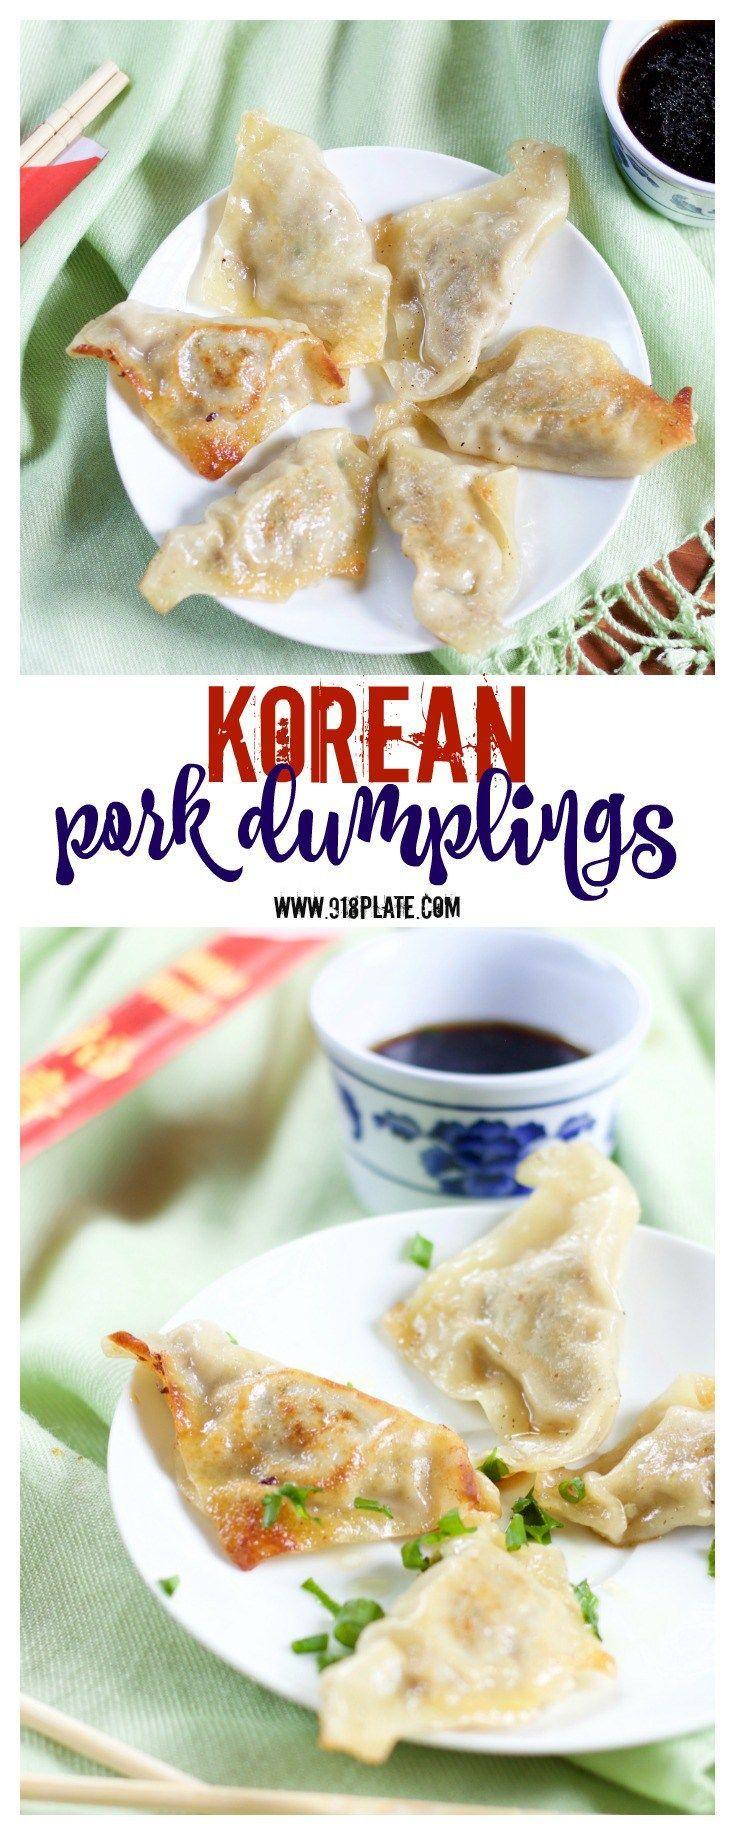 This recipe for authentic Korean pork dumplings, Mandu, makes enough for a crowd or lots of snacks!